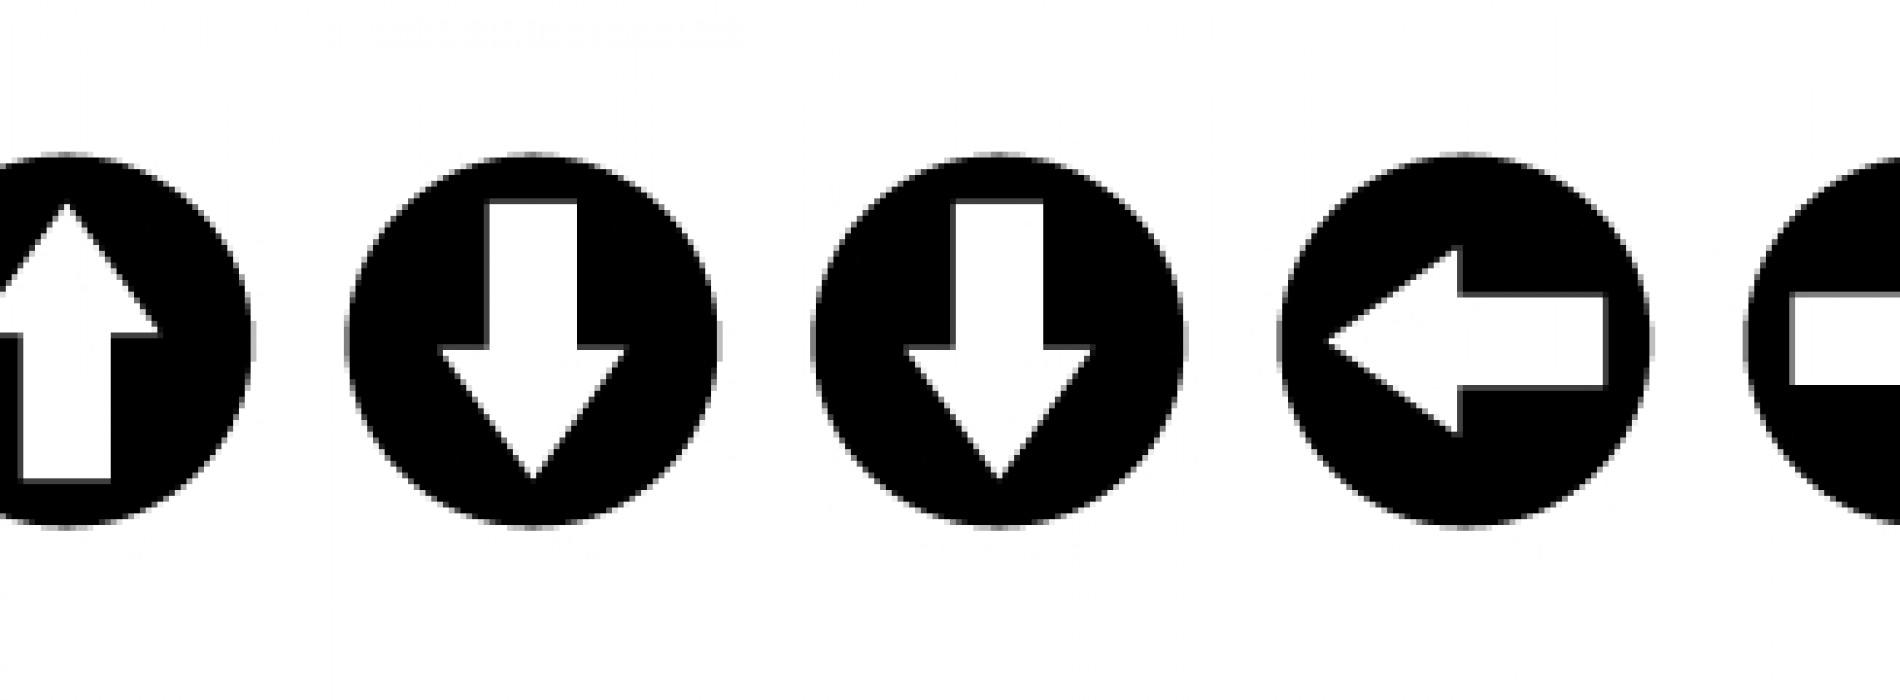 Konami Code in Google Voice Search unlocks easter egg